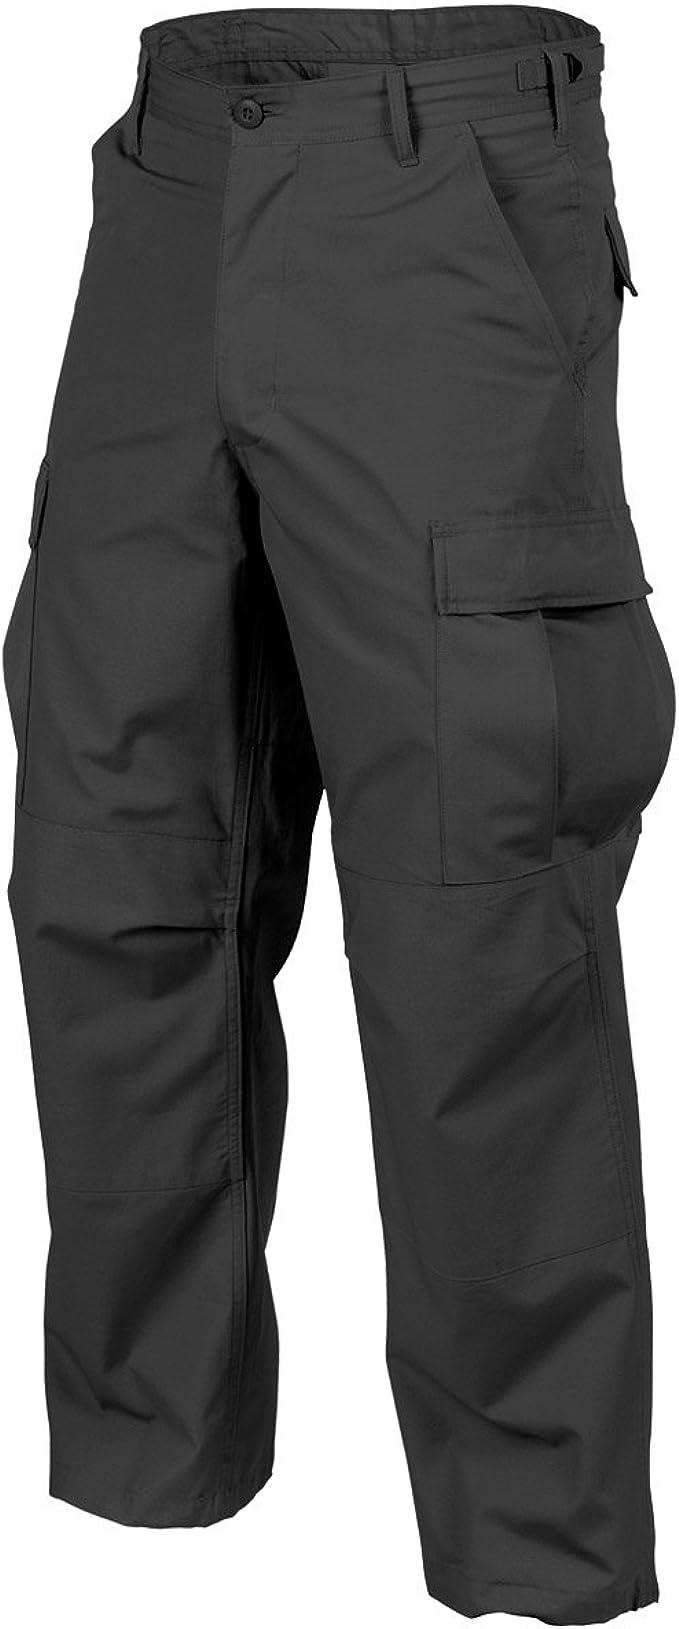 Helikon genuino BDU pantalones Cotton Ripstop Khaki tama/ño L